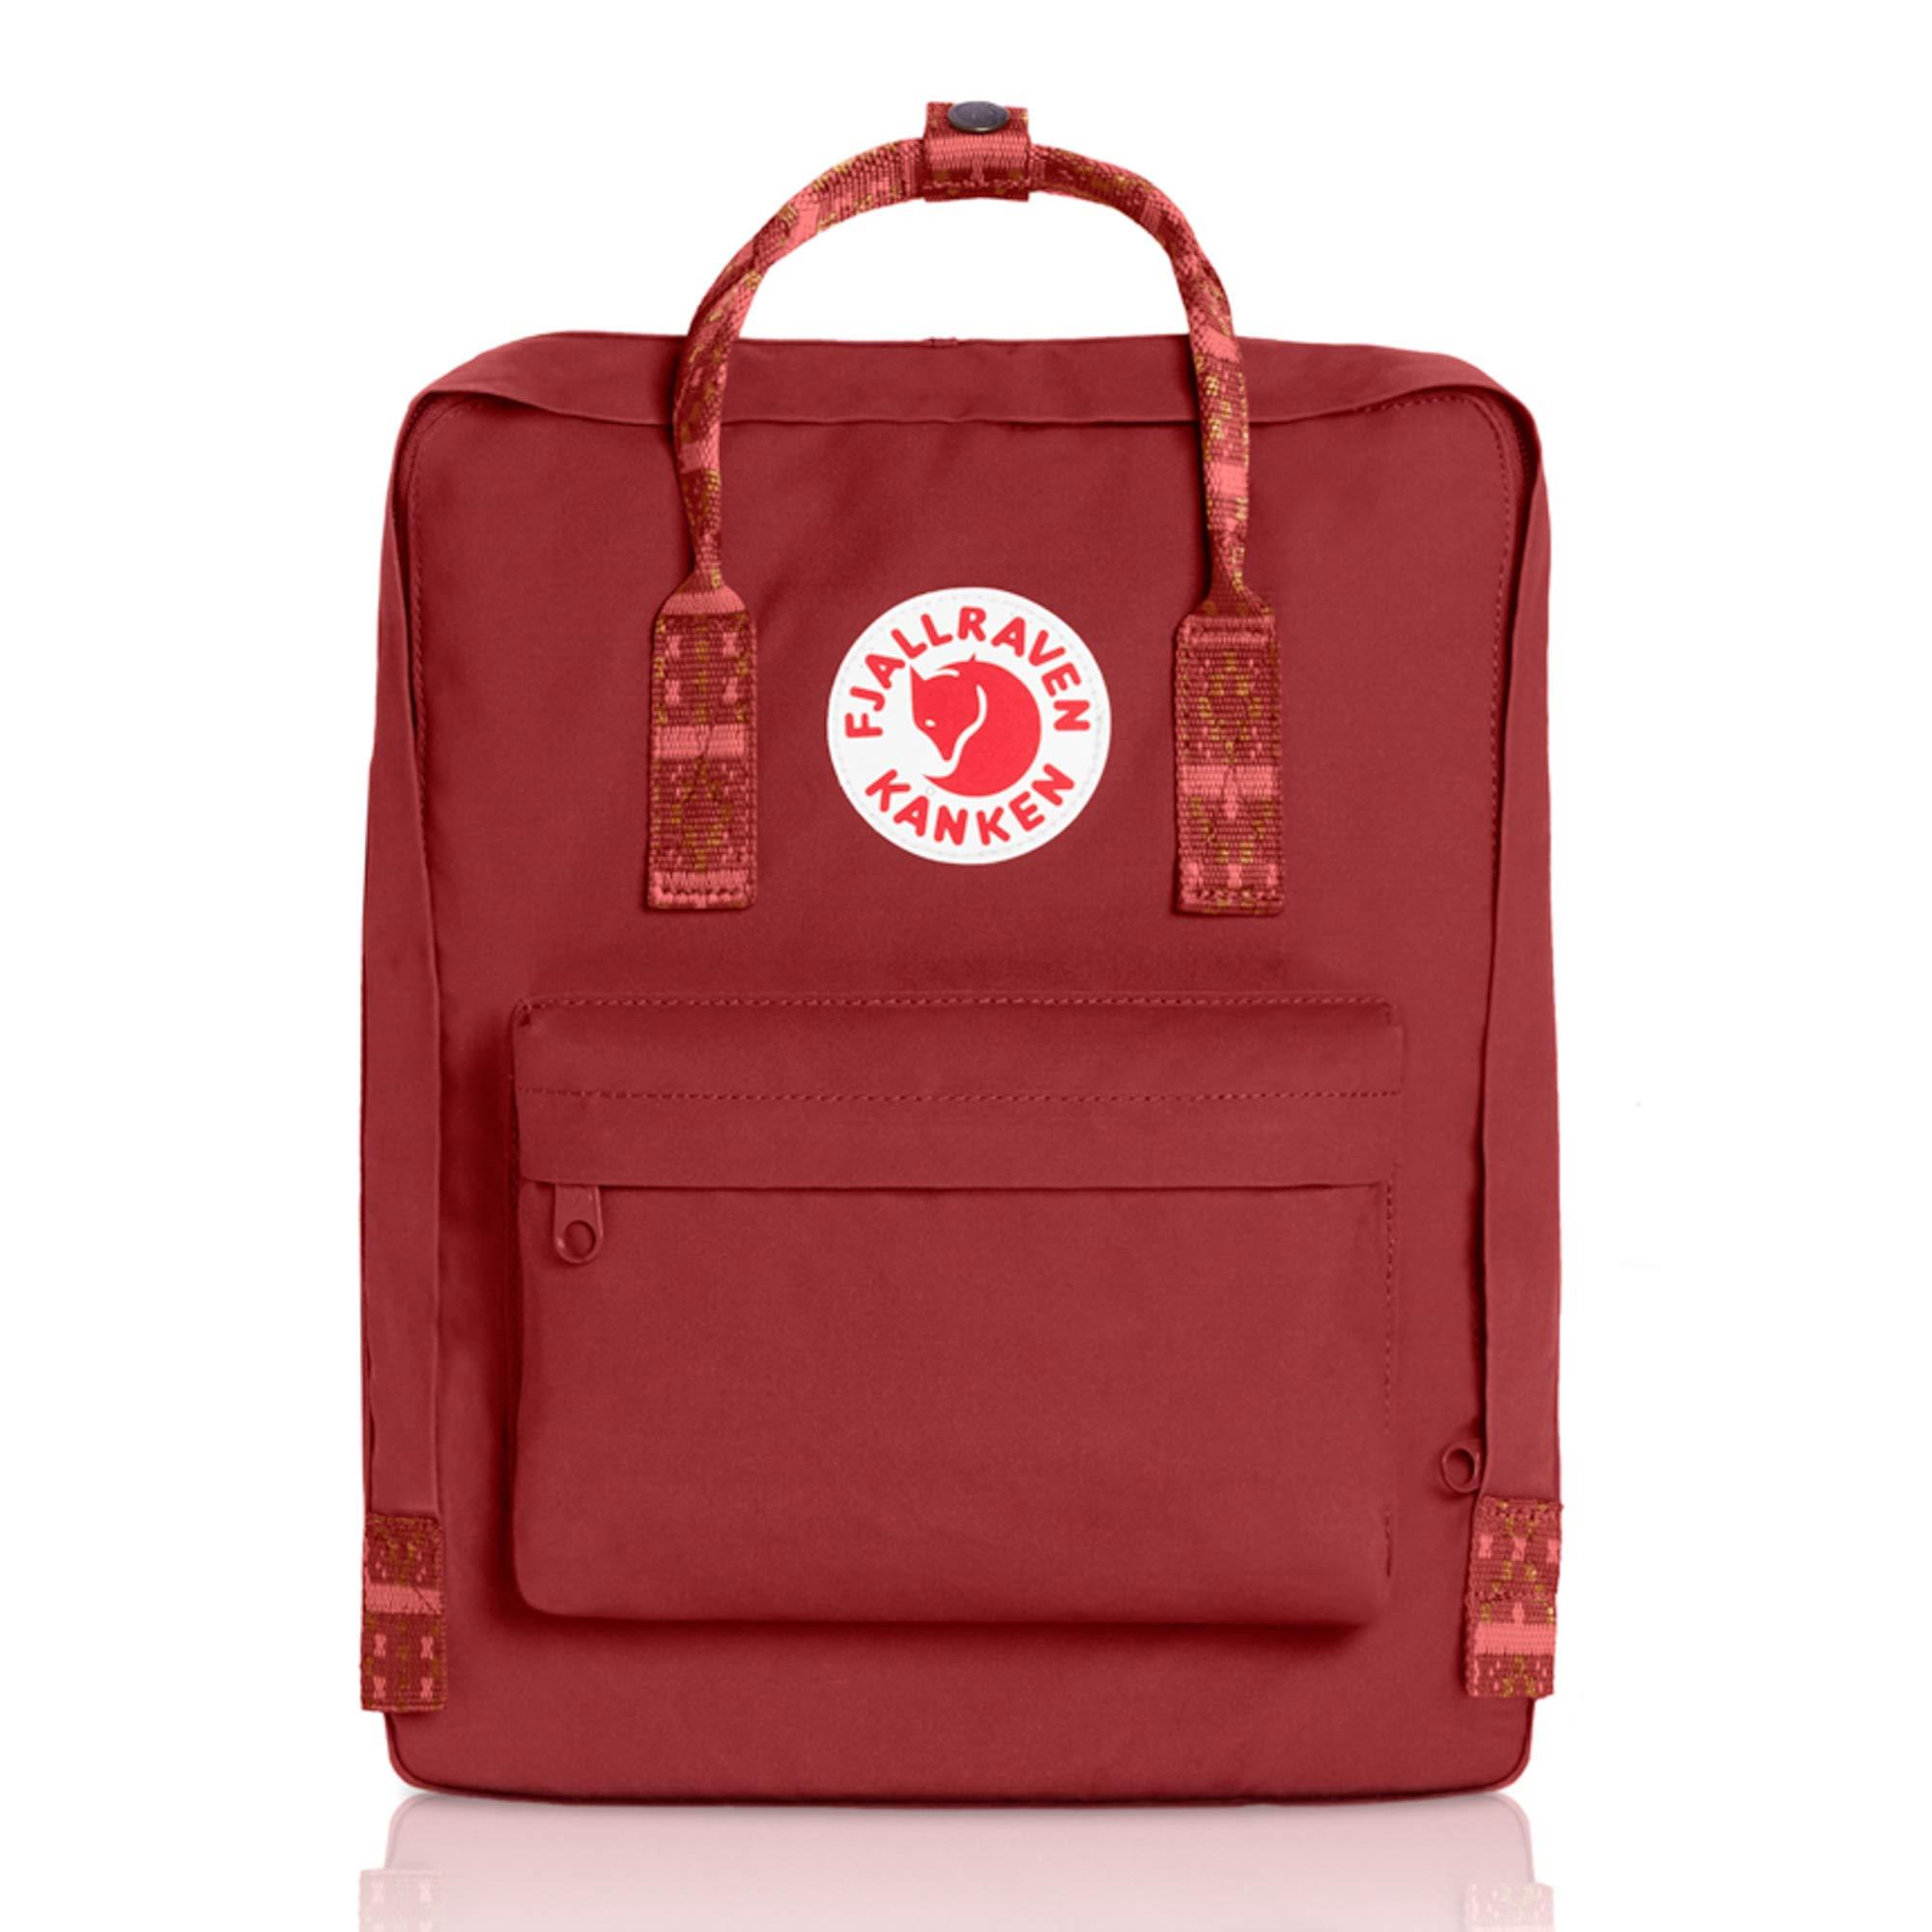 Fjallraven - Kanken Classic Backpack for Everyday, Deep Red/Folk Pattern